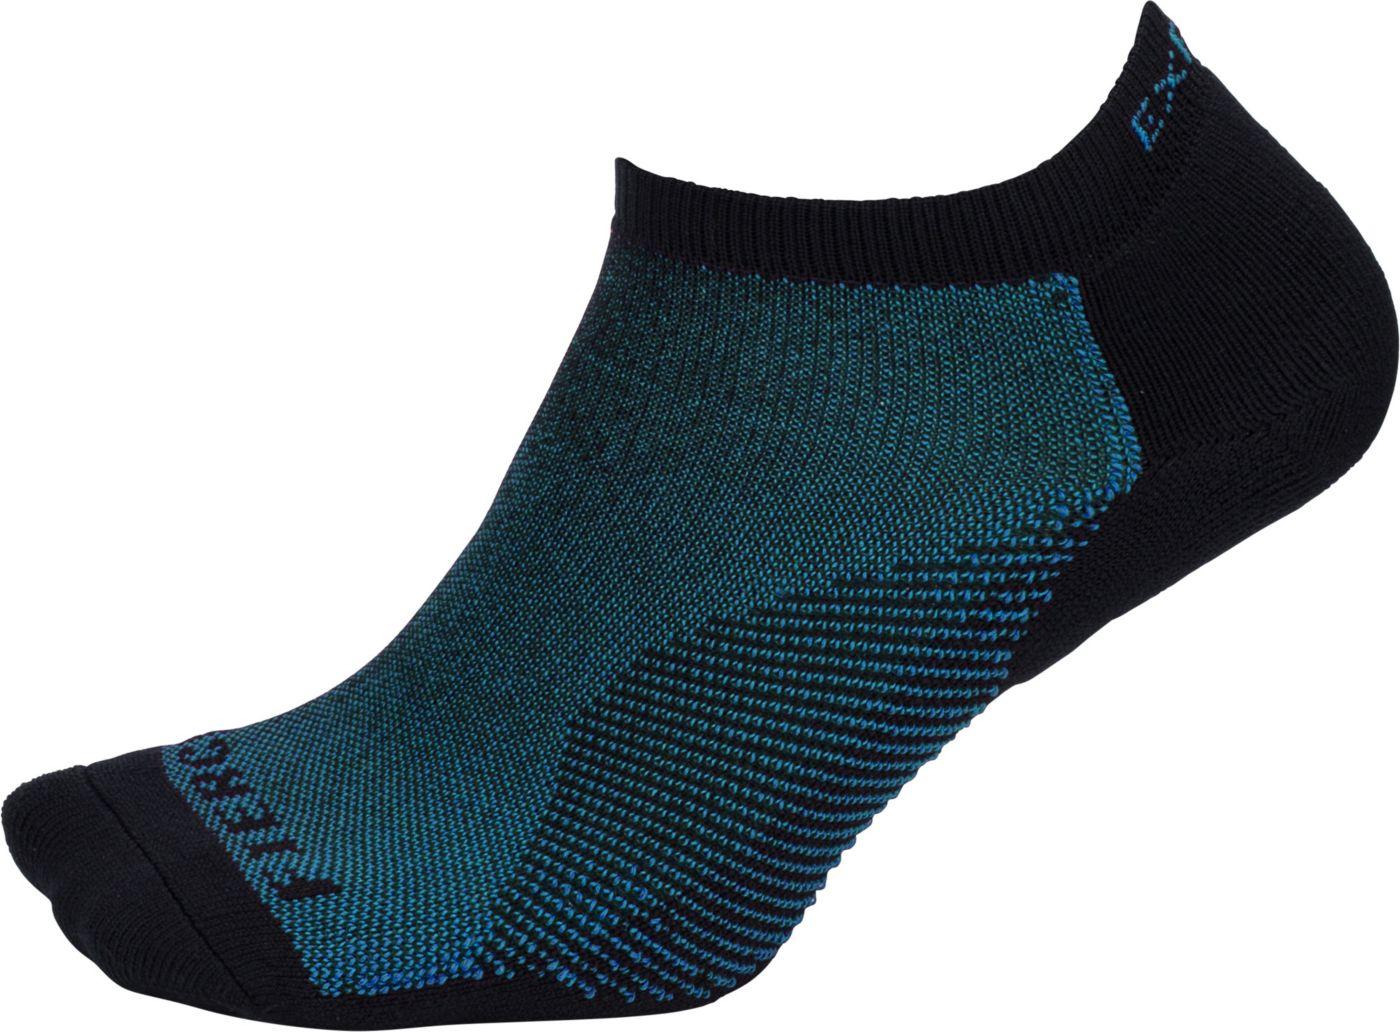 Thorlos Experia Adult Fierce Low Cut Socks